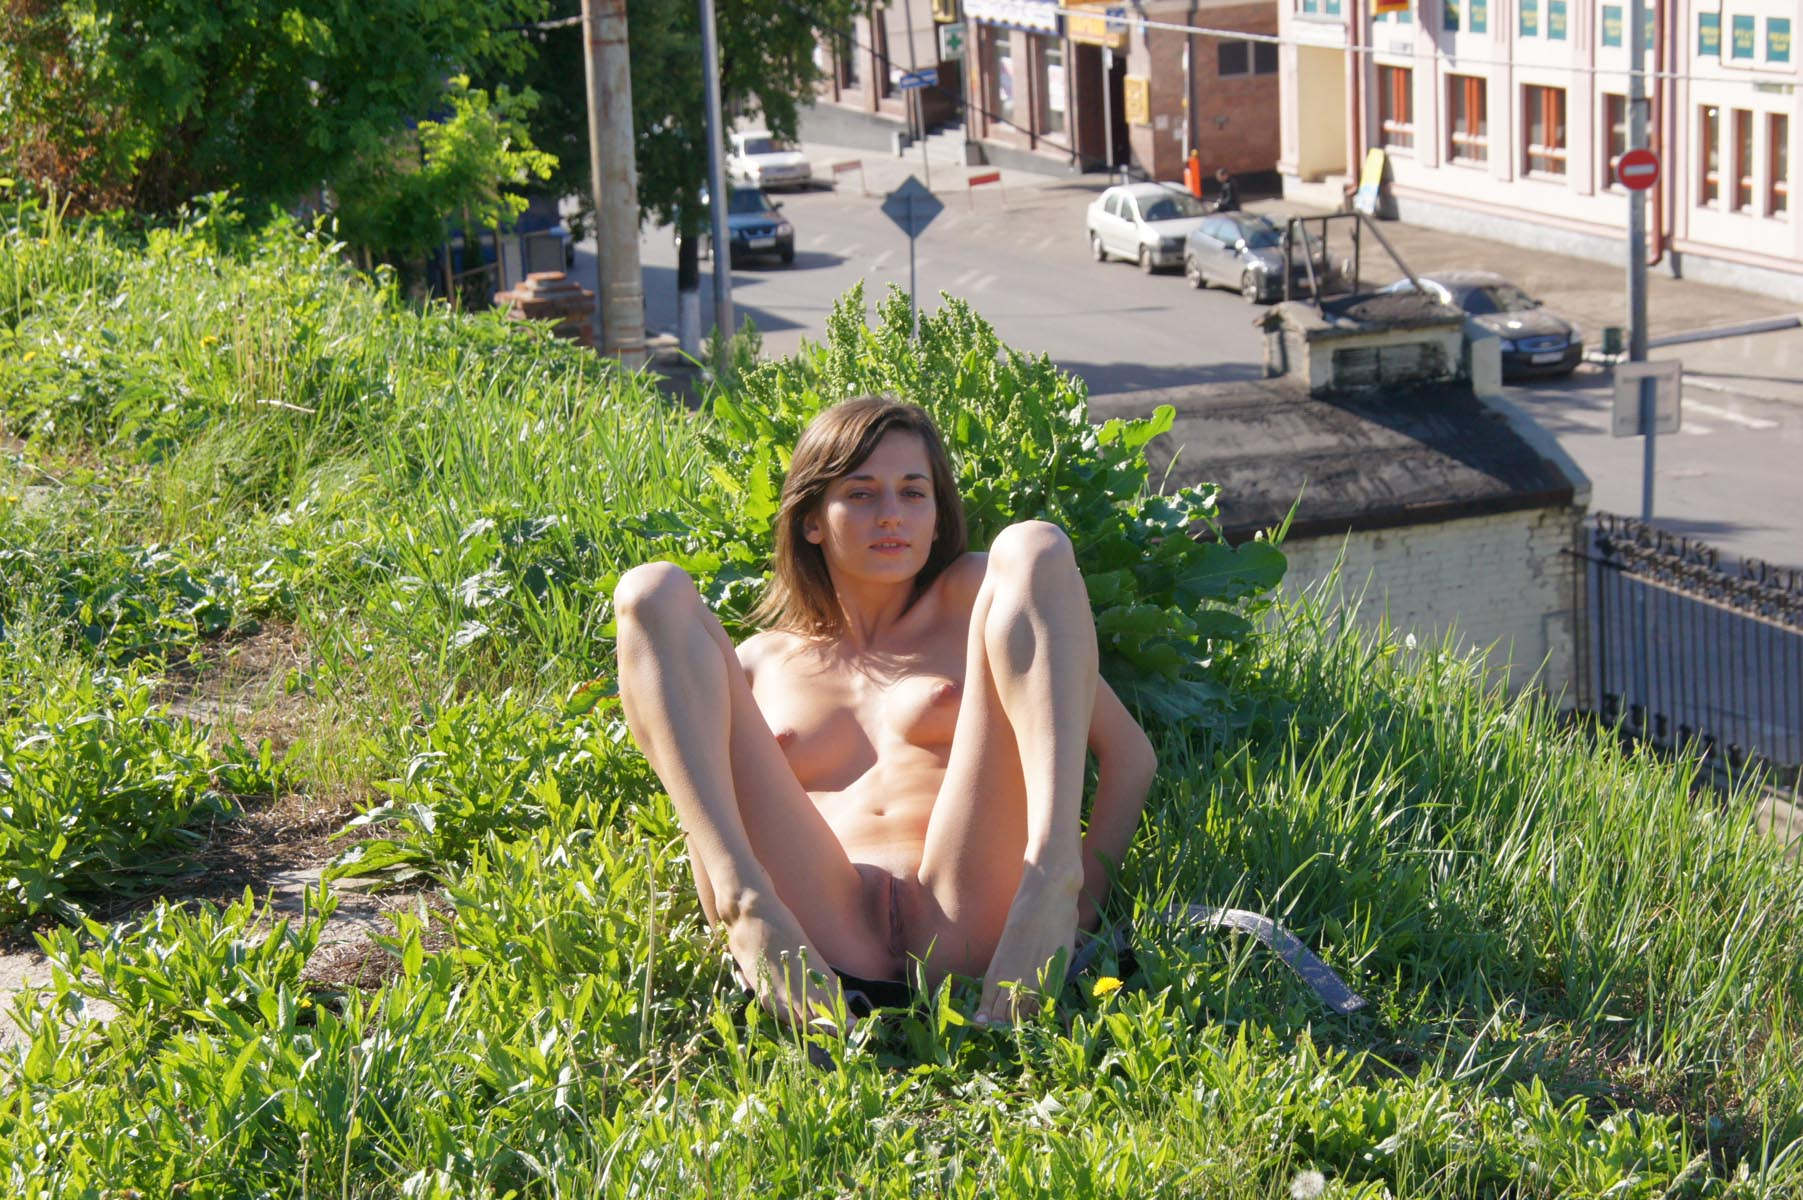 irina-k-naked-in-russia-kazan-nude-public-08